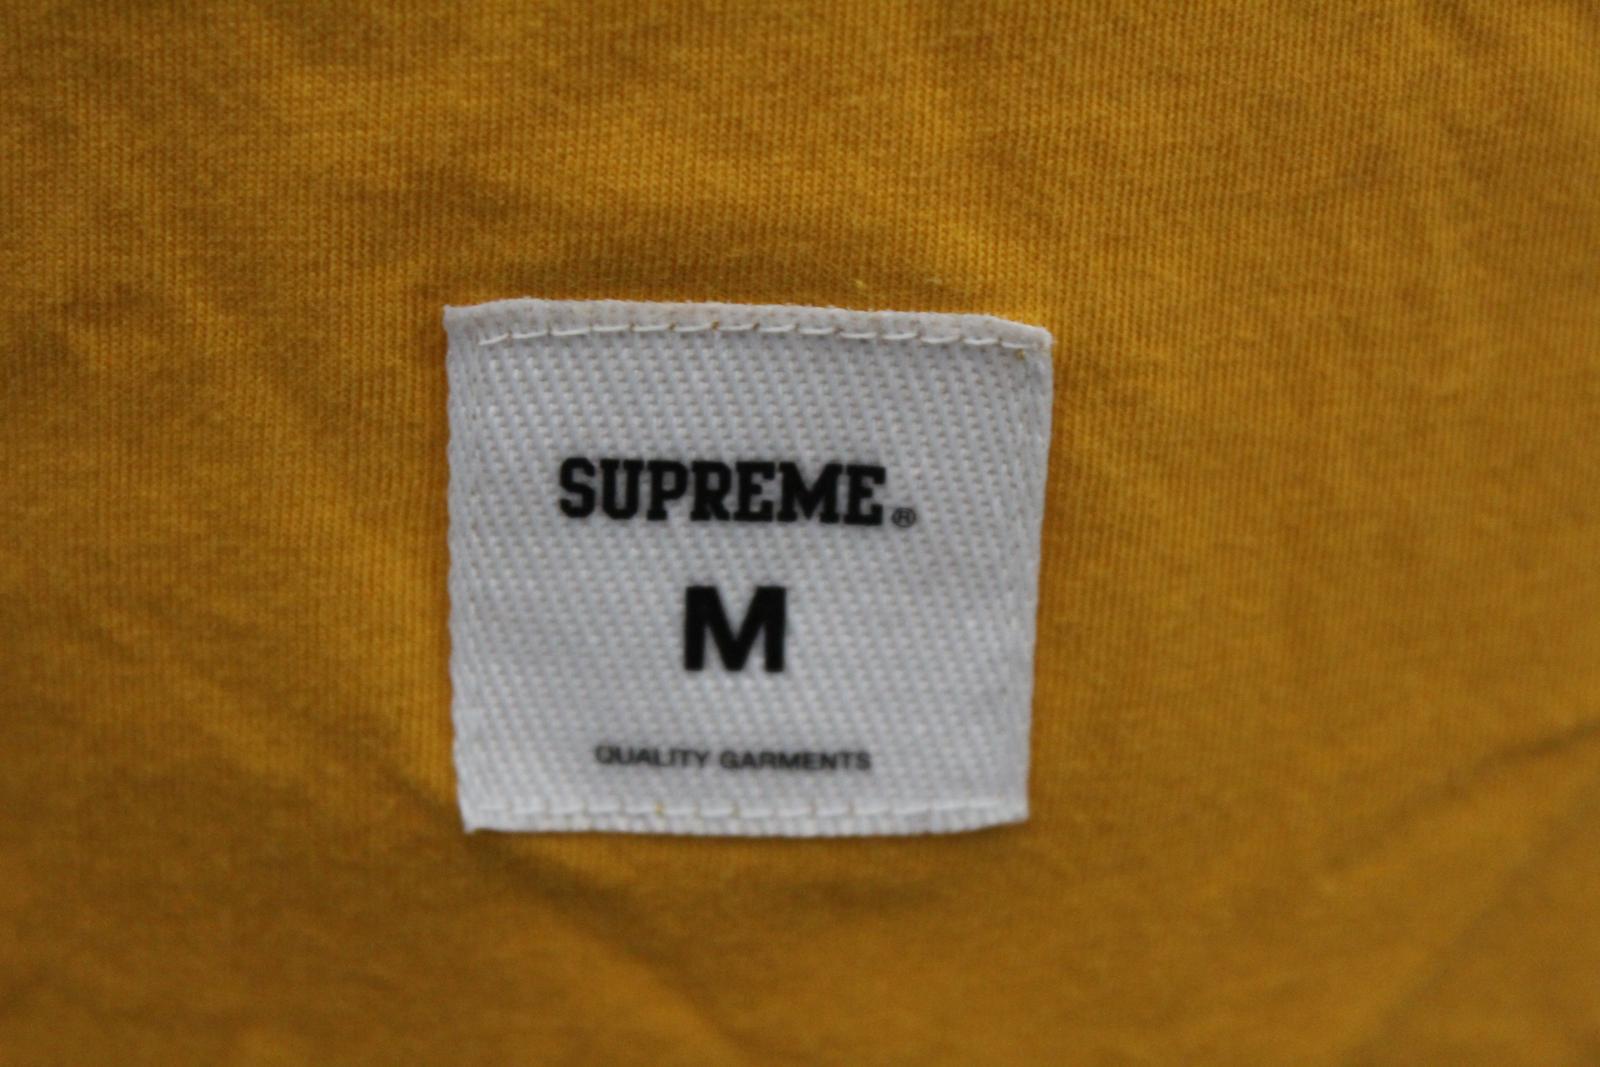 84cca9a55c1e SUPREME Men's Yellow Cotton Short Sleeve Vampirella Graphic T-Shirt Size M  4 4 of 12 ...